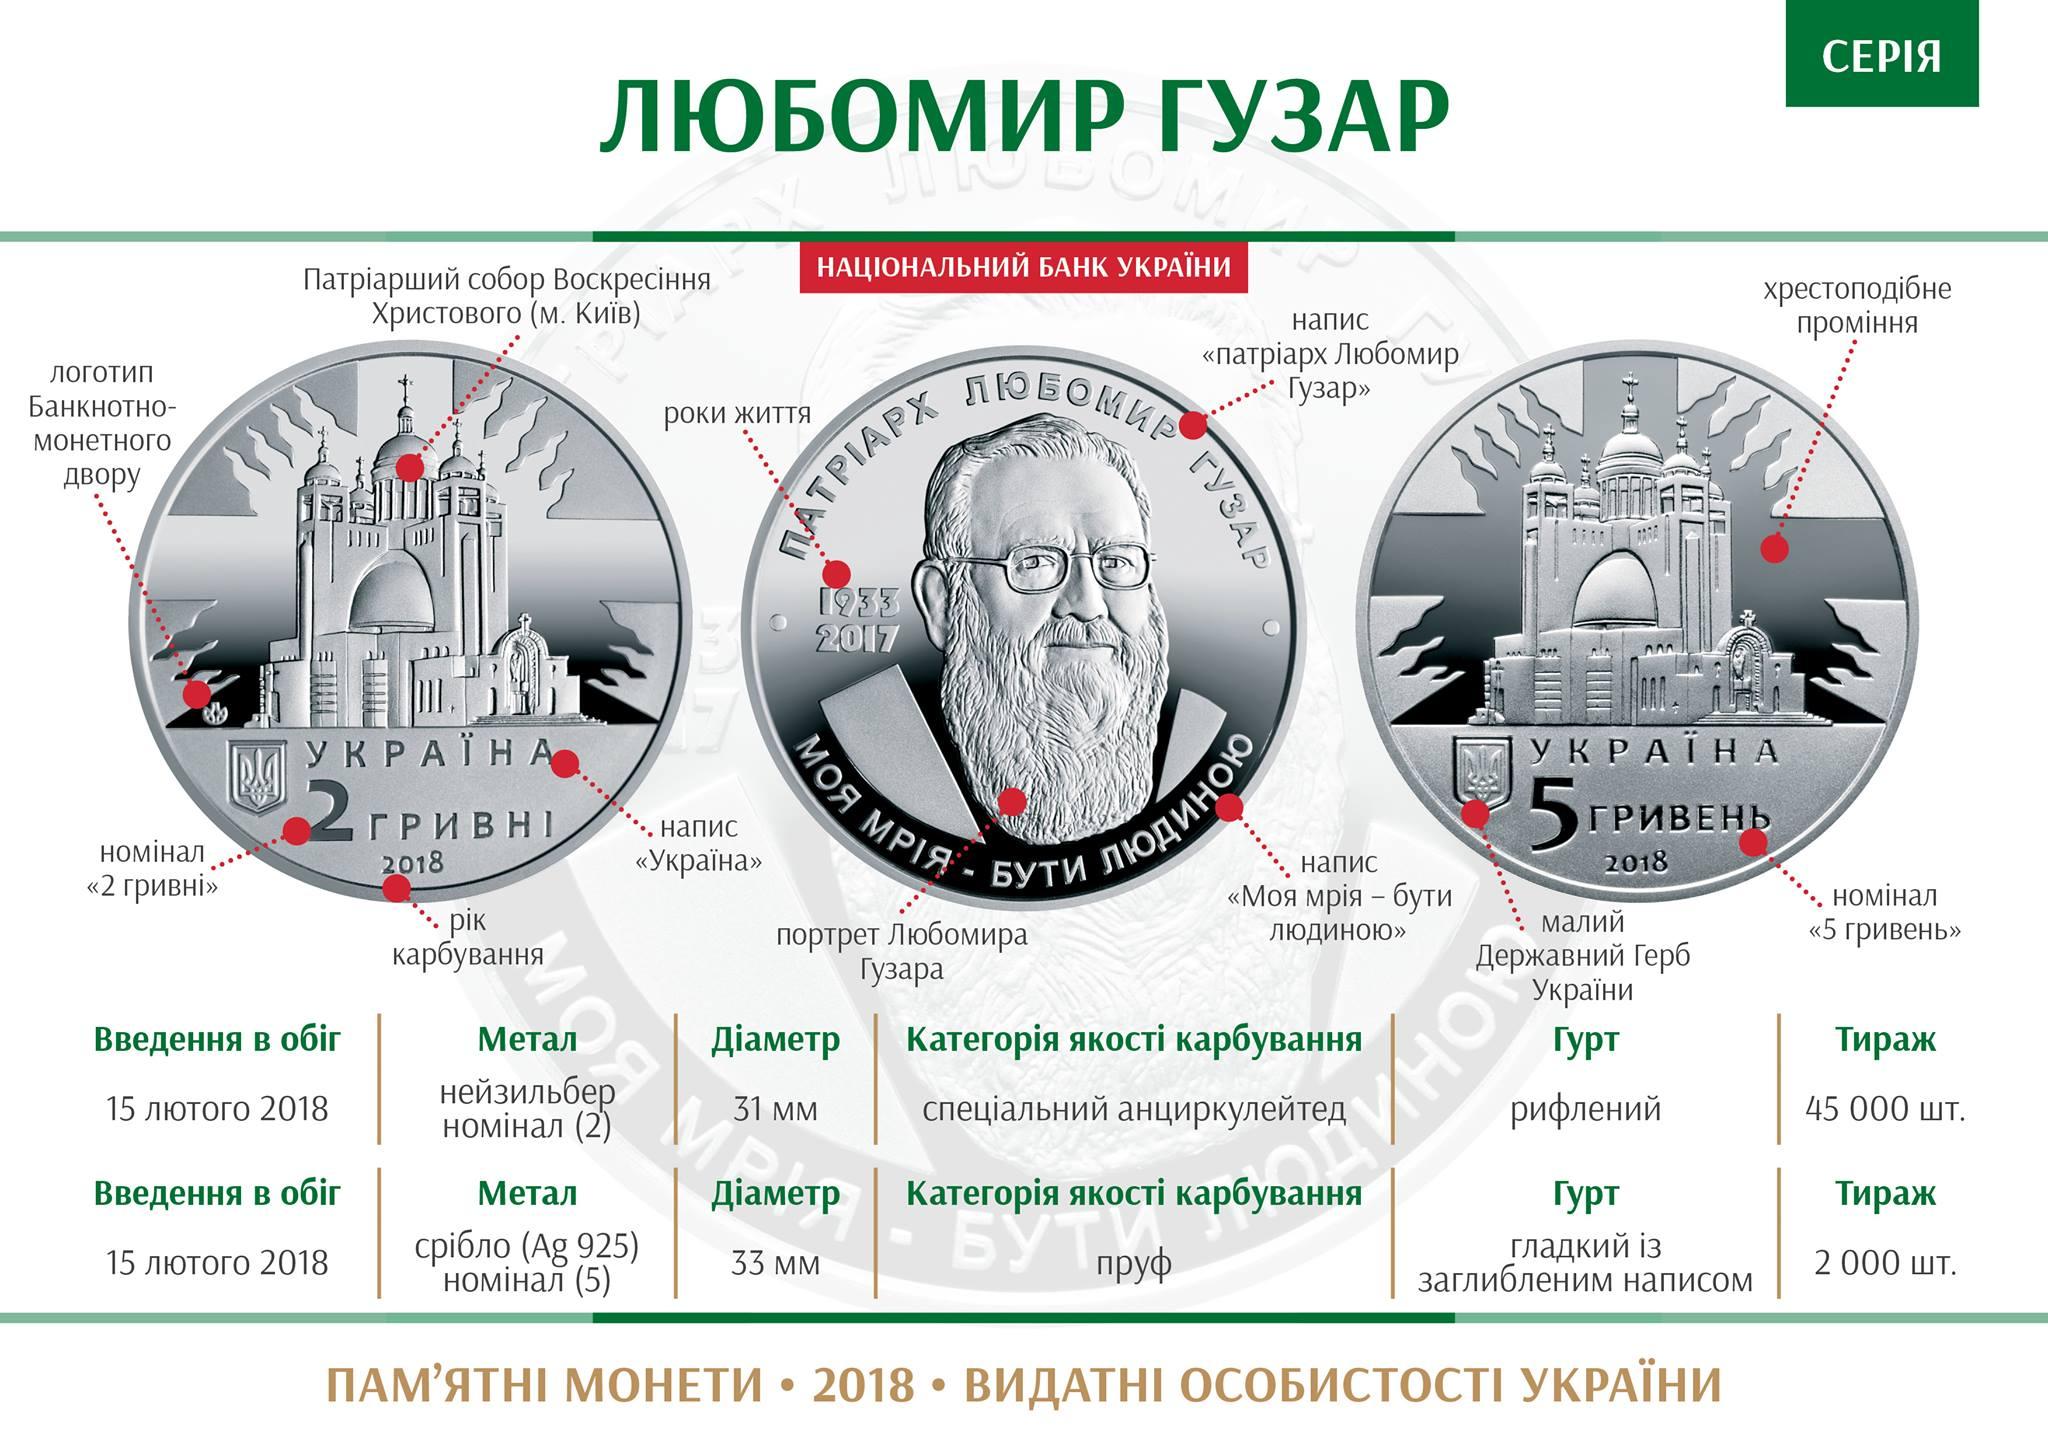 Нацбанк выпускает памятную монету вчесть Любомира Гузара